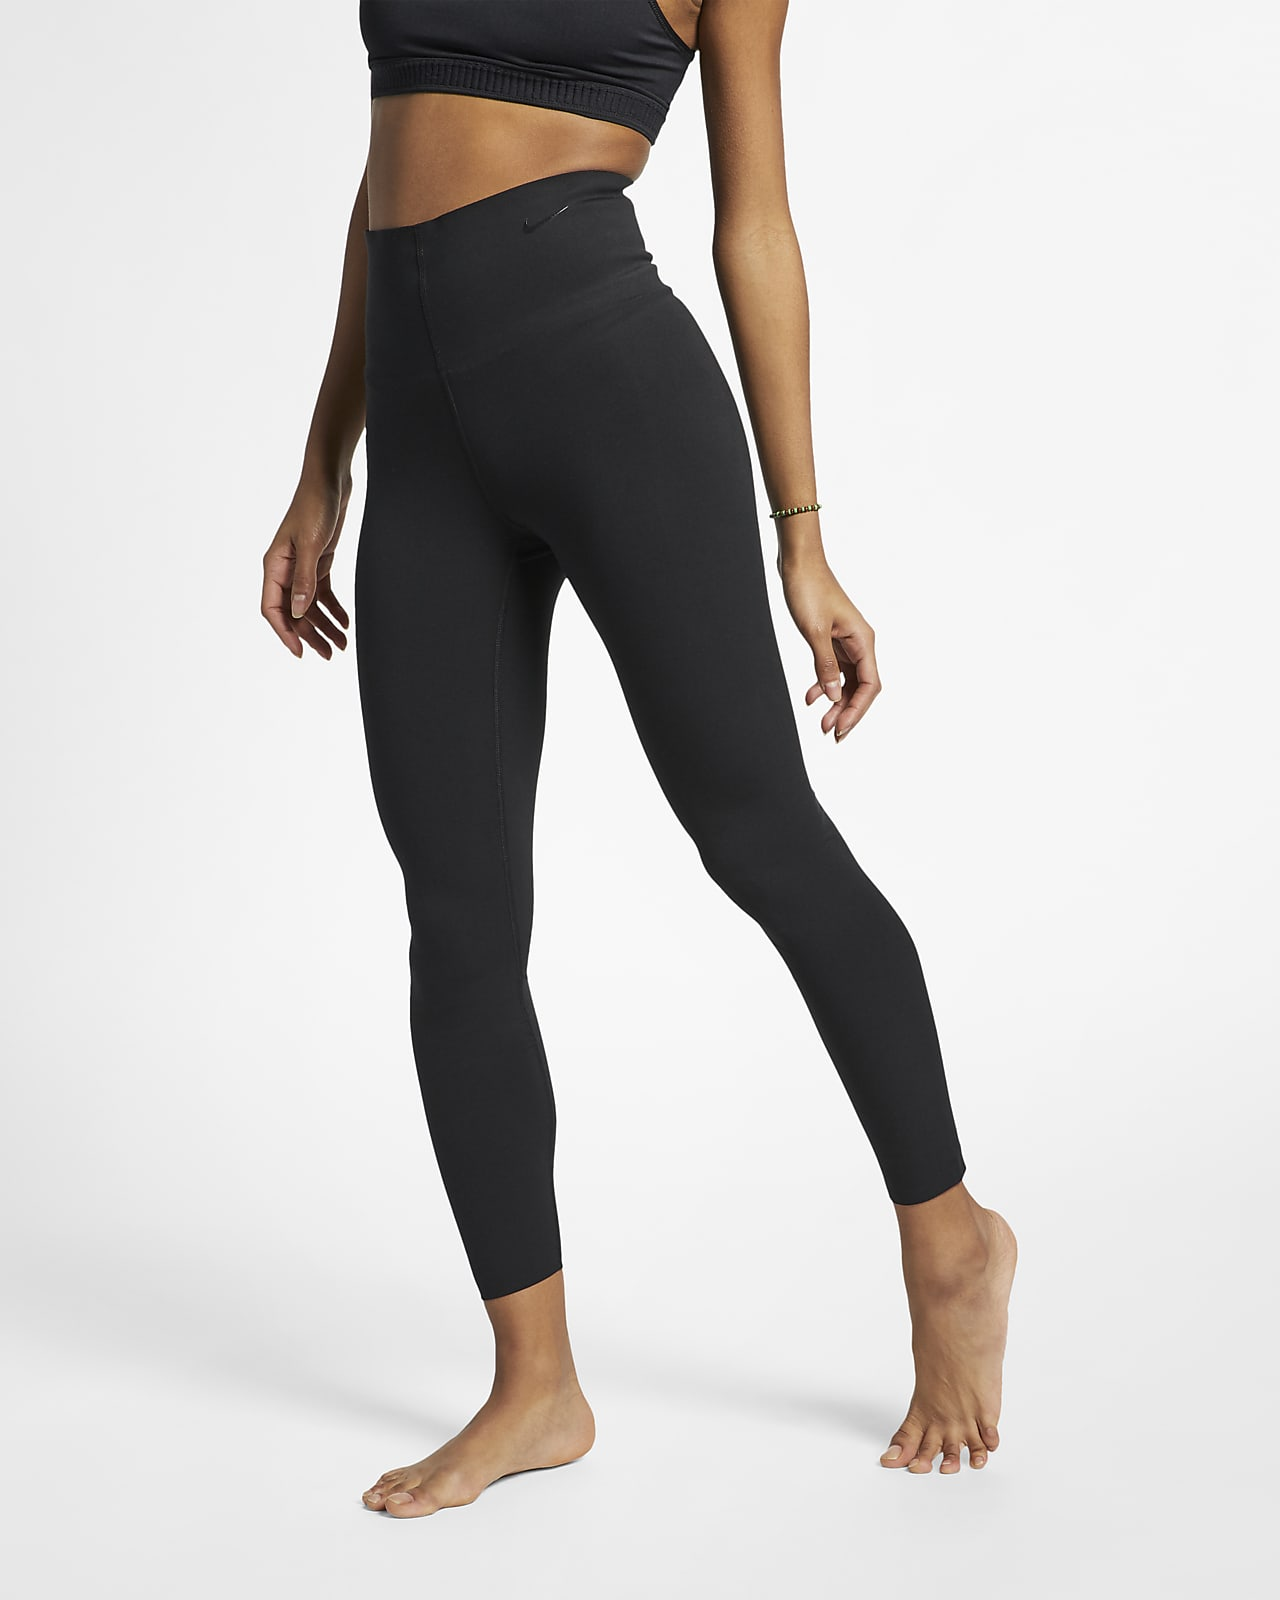 Leggings a 7/8 Nike Sculpt Luxe - Donna